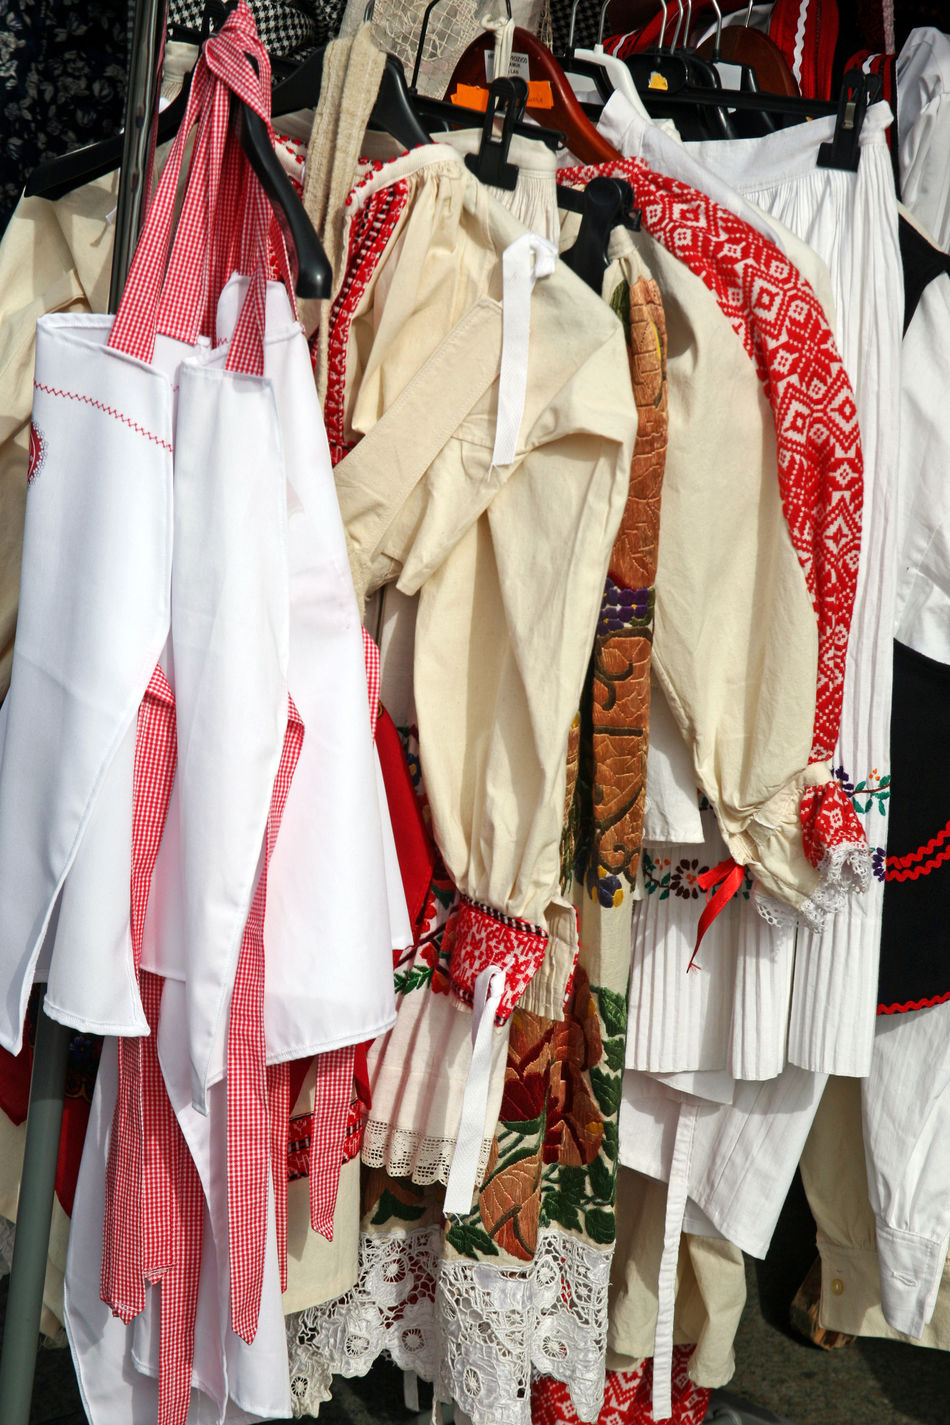 'Home-made is home-made',fair,9,traditional costumes,Zagreb 2016. 'home-made Is Home-made Choice Cloth Clothing Costumes Craftmanship Croatia Eu Fair Hand-made Hanging Outdoors Textile Tradition Traditional Costumes Variation Zagreb